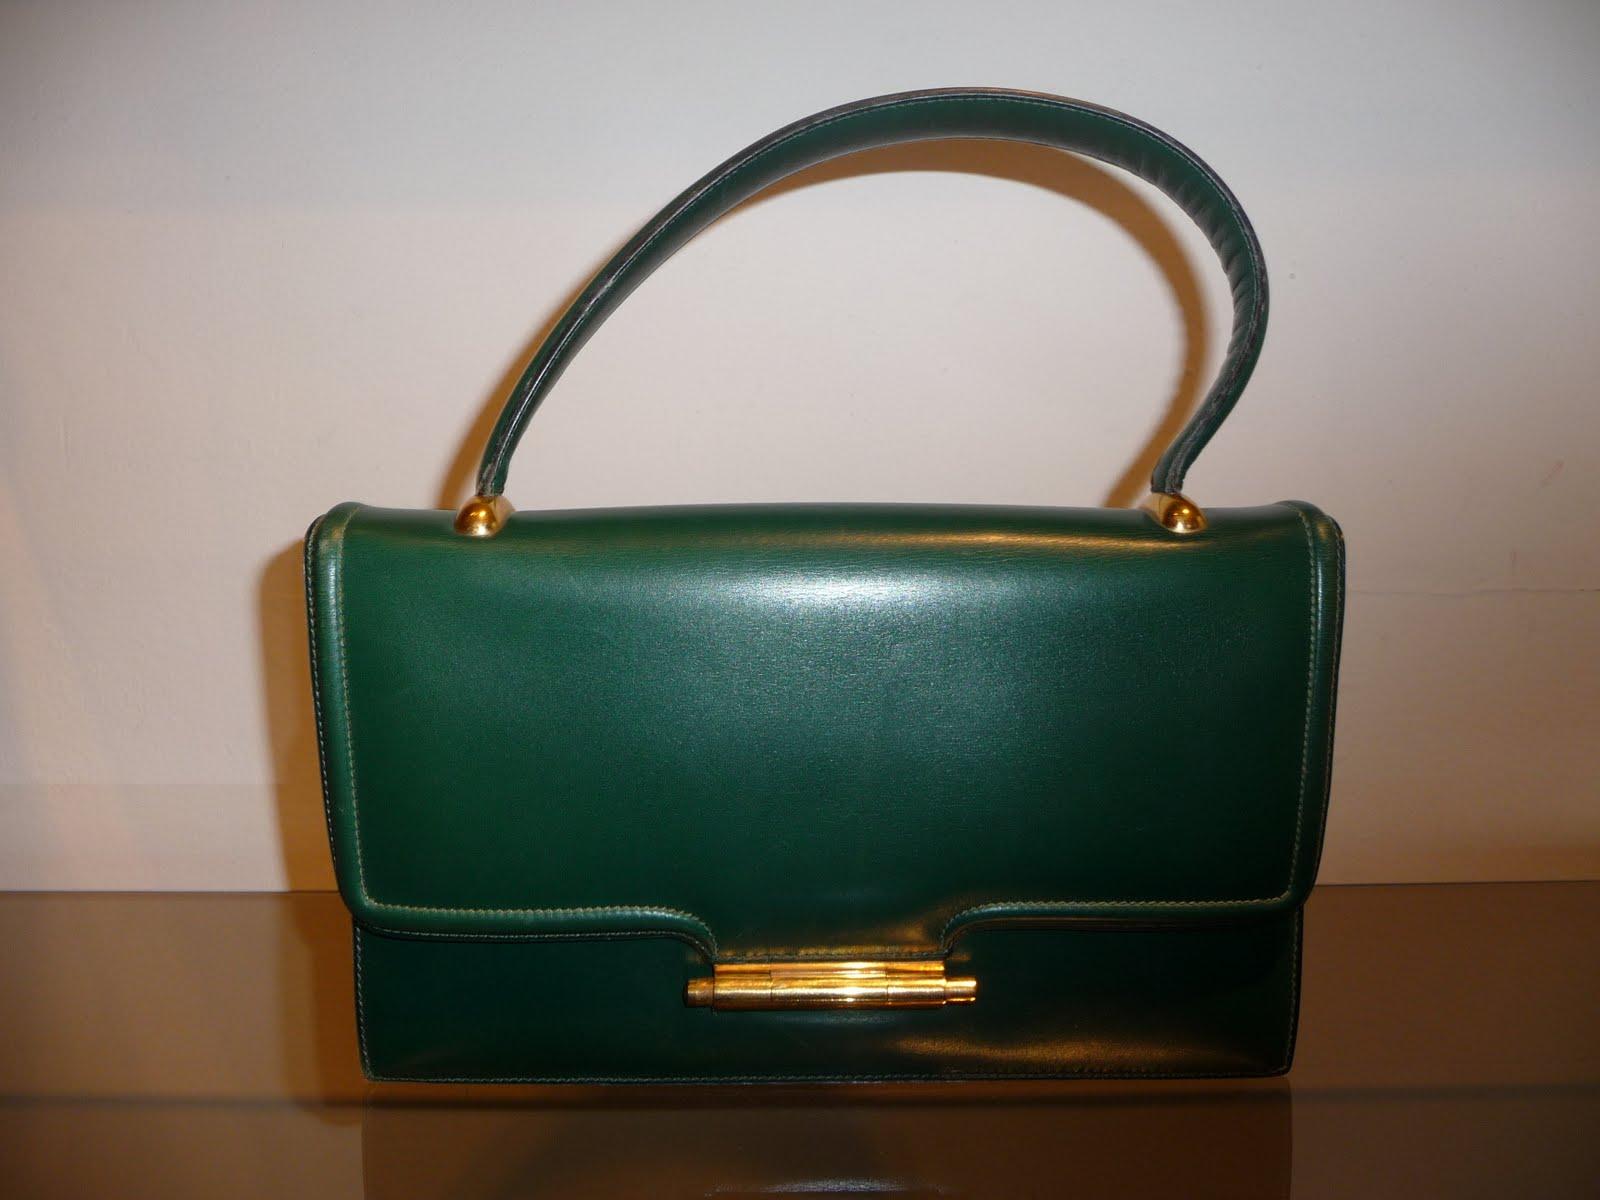 birkin bag price range - DECADES INC.: MAD ABOUT THE HARDWARE